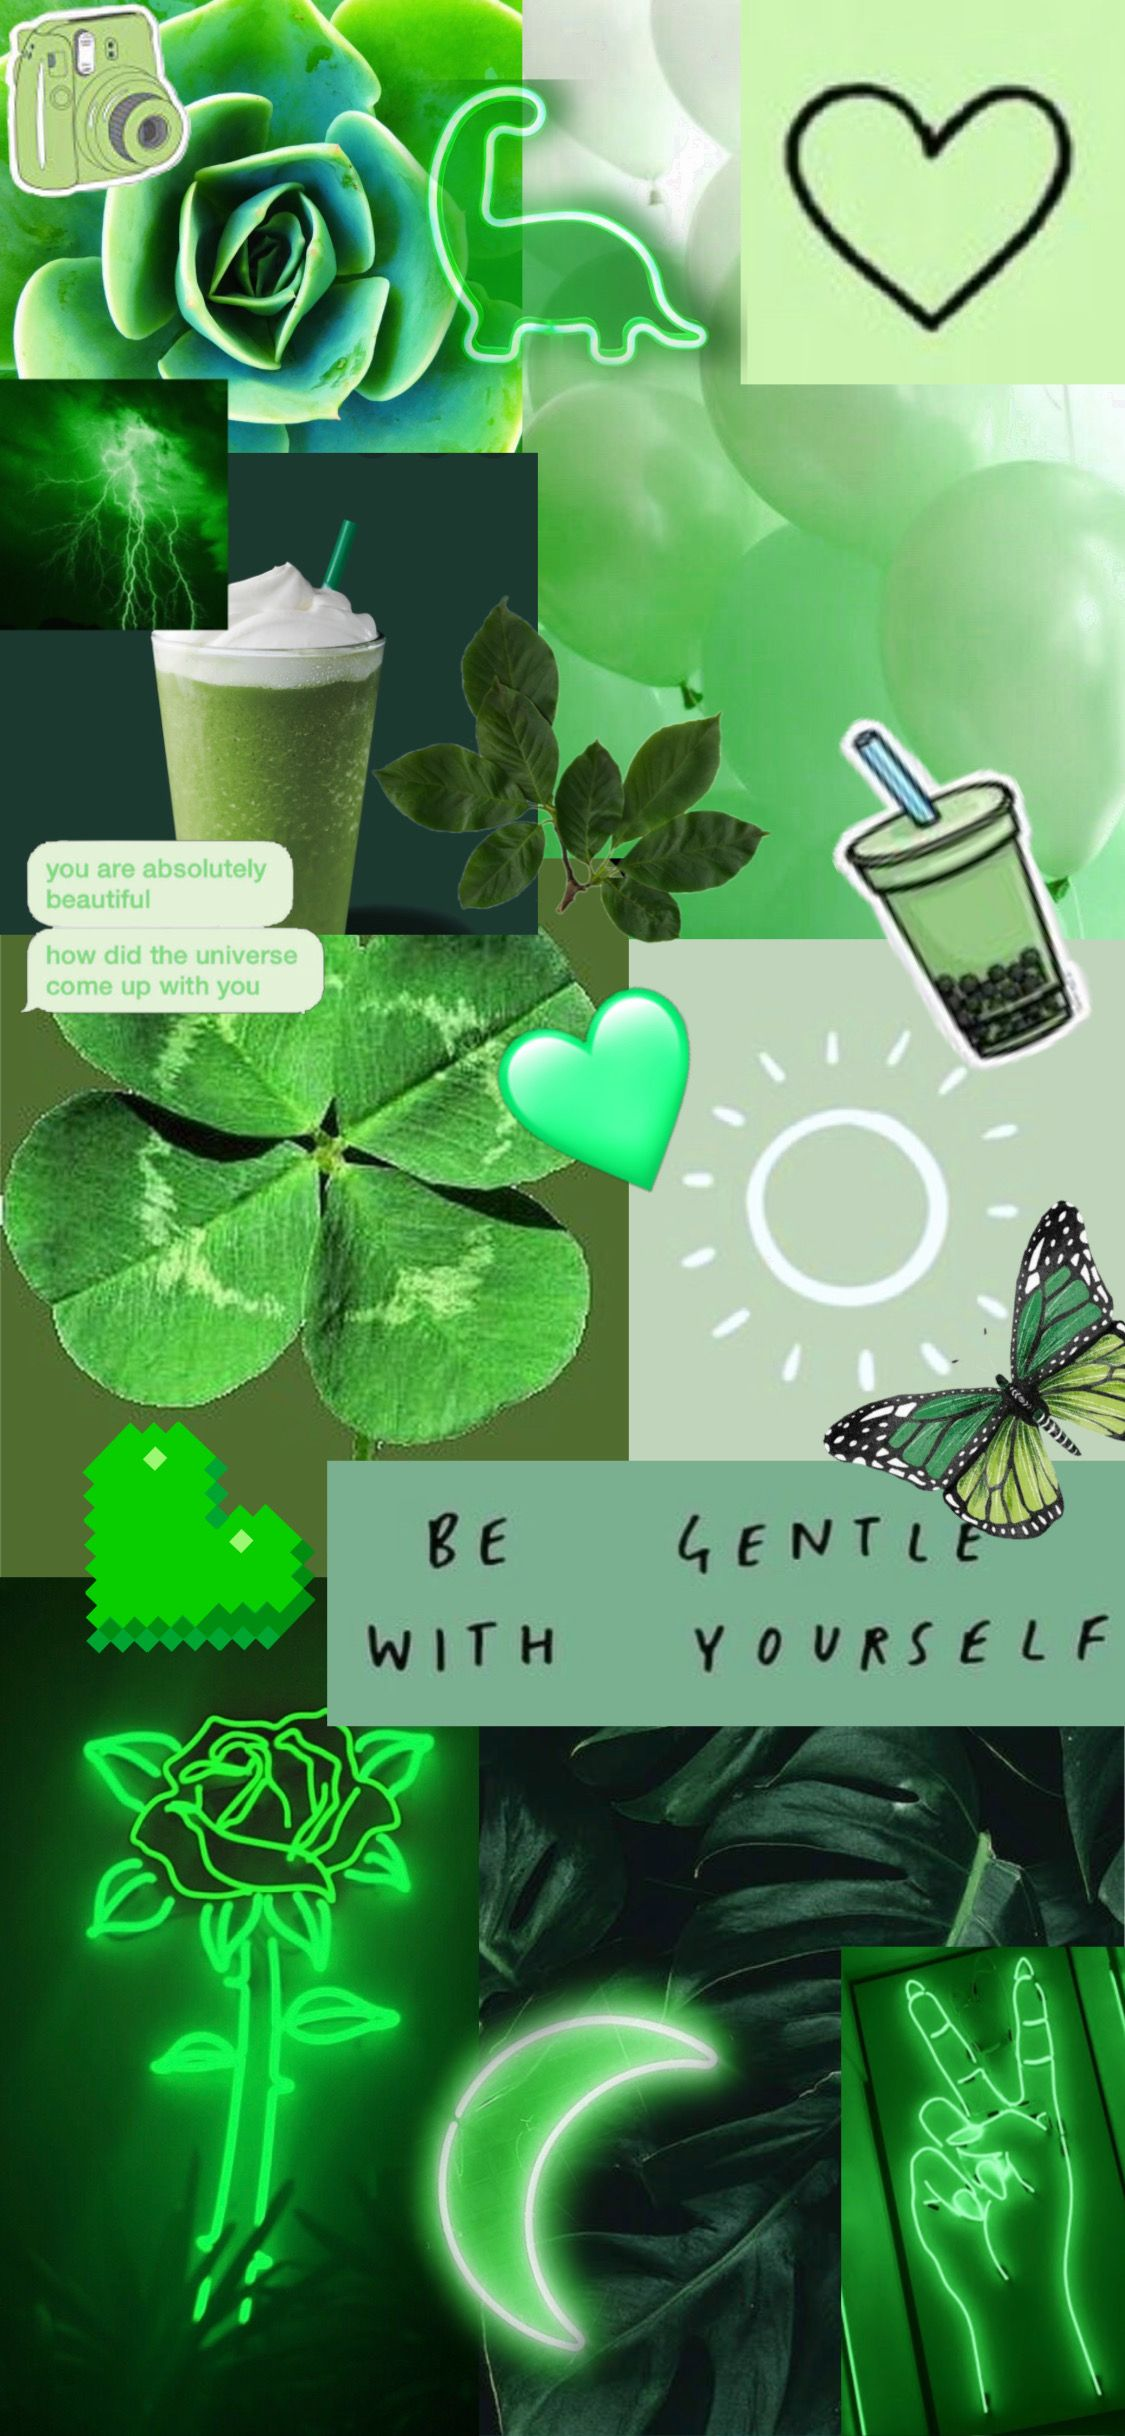 Green Aesthetic Wallpaper En 2020 Fond D Ecran Vert Fond D Ecran Iphone Pastel Fond D Ecran Telephone